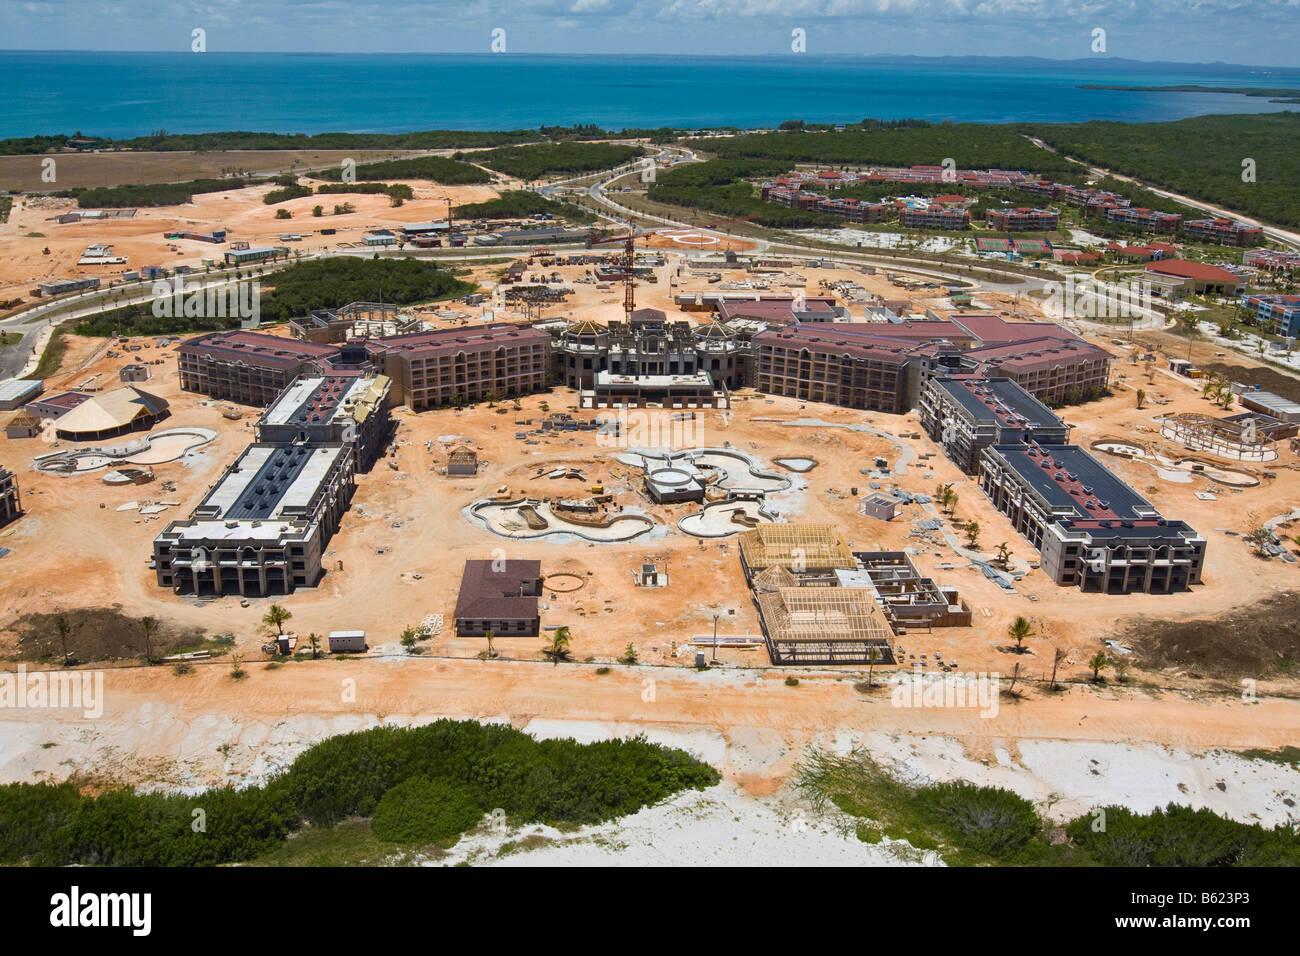 New luxury hotel under construction on varadero cuba caribbean central america america